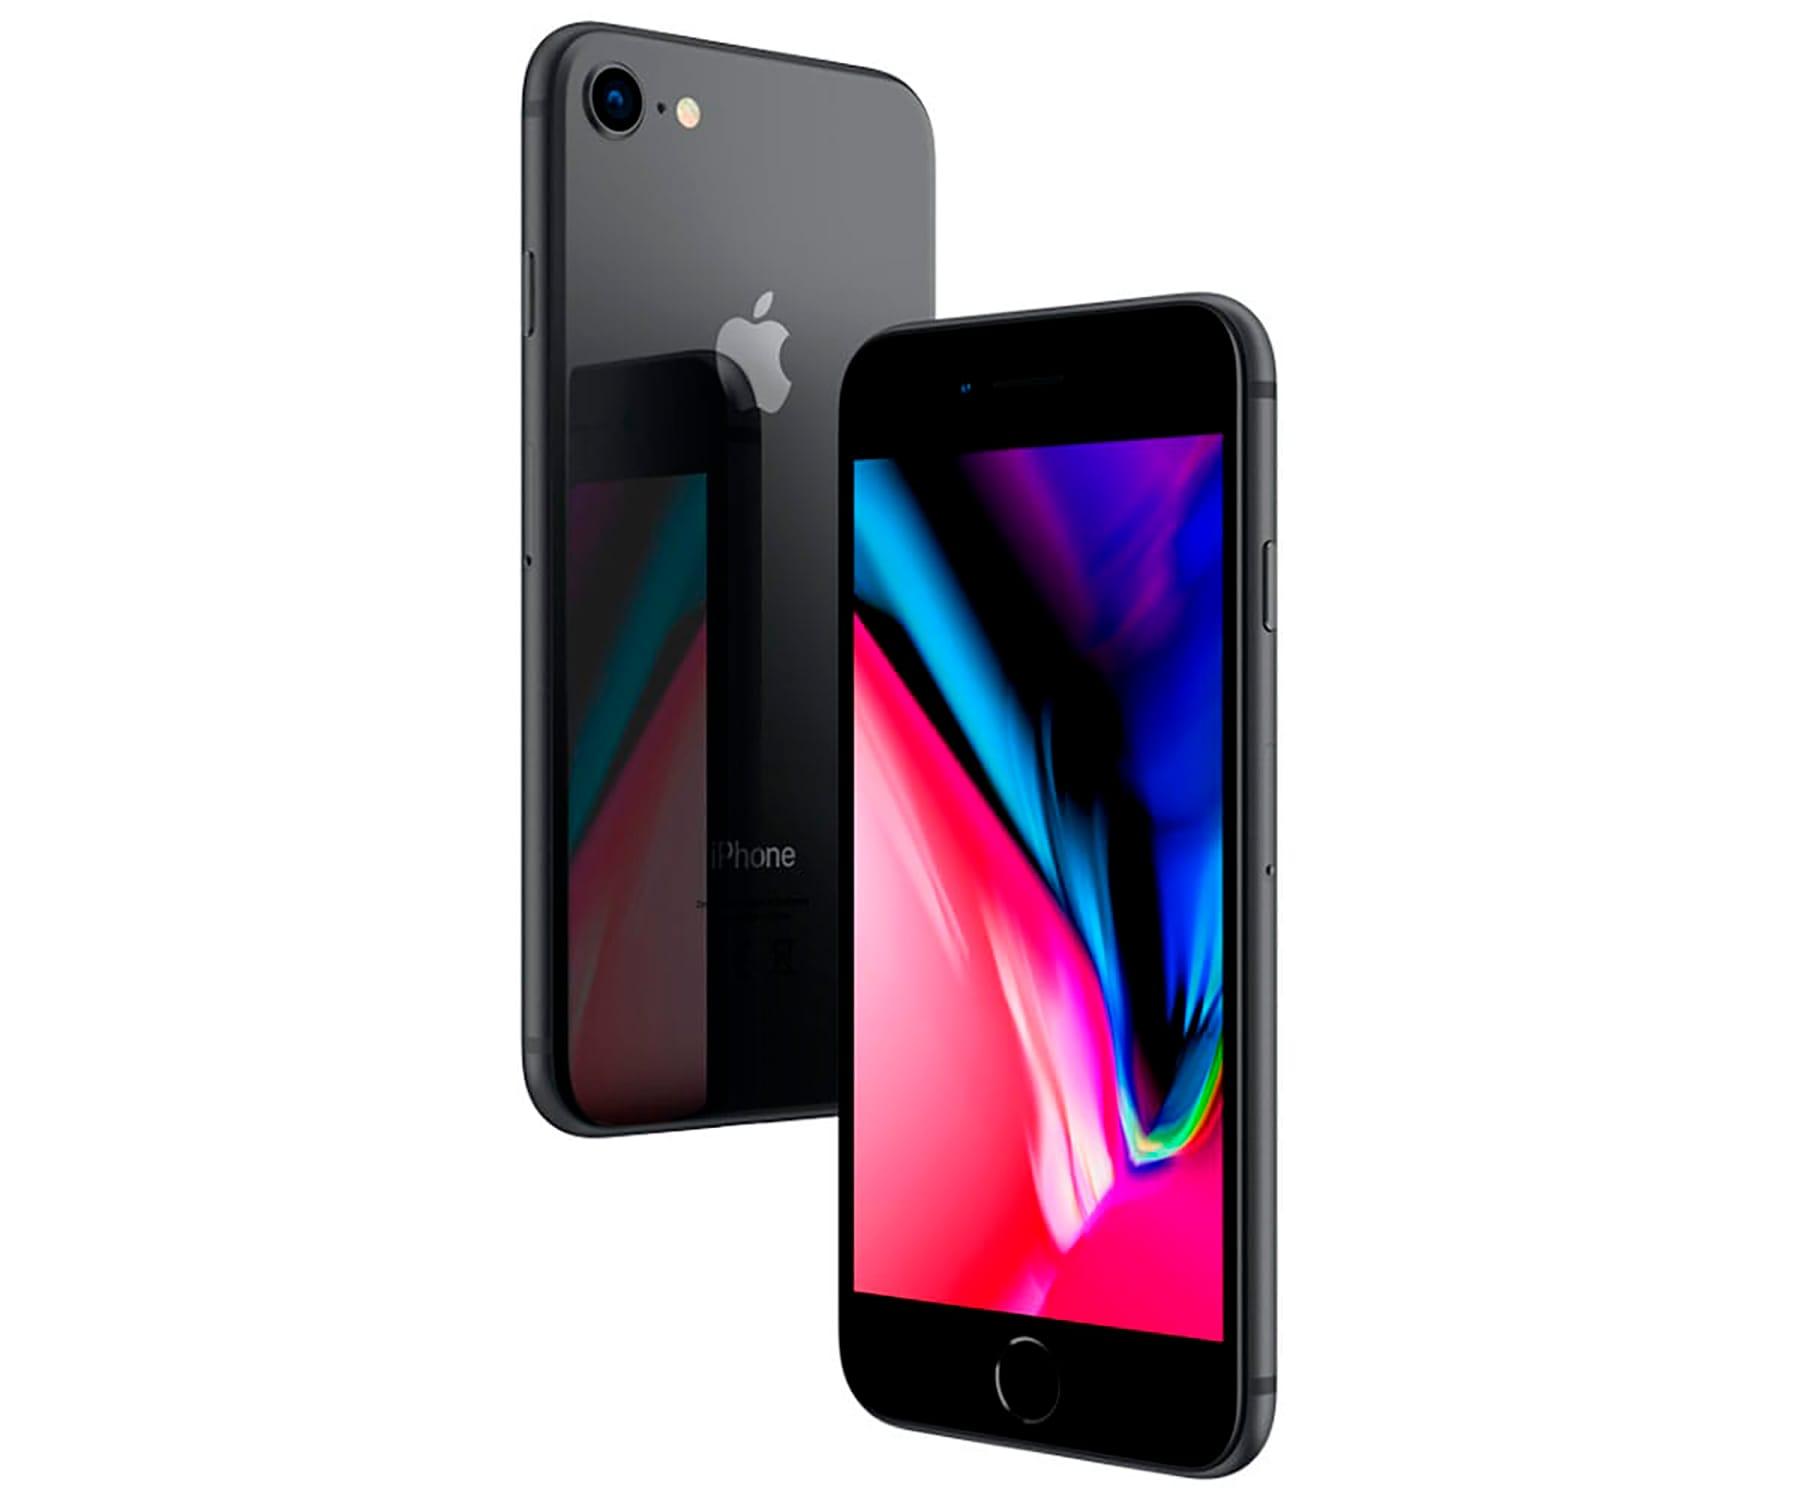 APPLE IPHONE 8 64GB GRIS ESPACIAL REACONDICIONADO CPO MÓVIL 4G 4.7'' RETINA HD/6CORE/64GB/2GB RAM/12MP/7MP